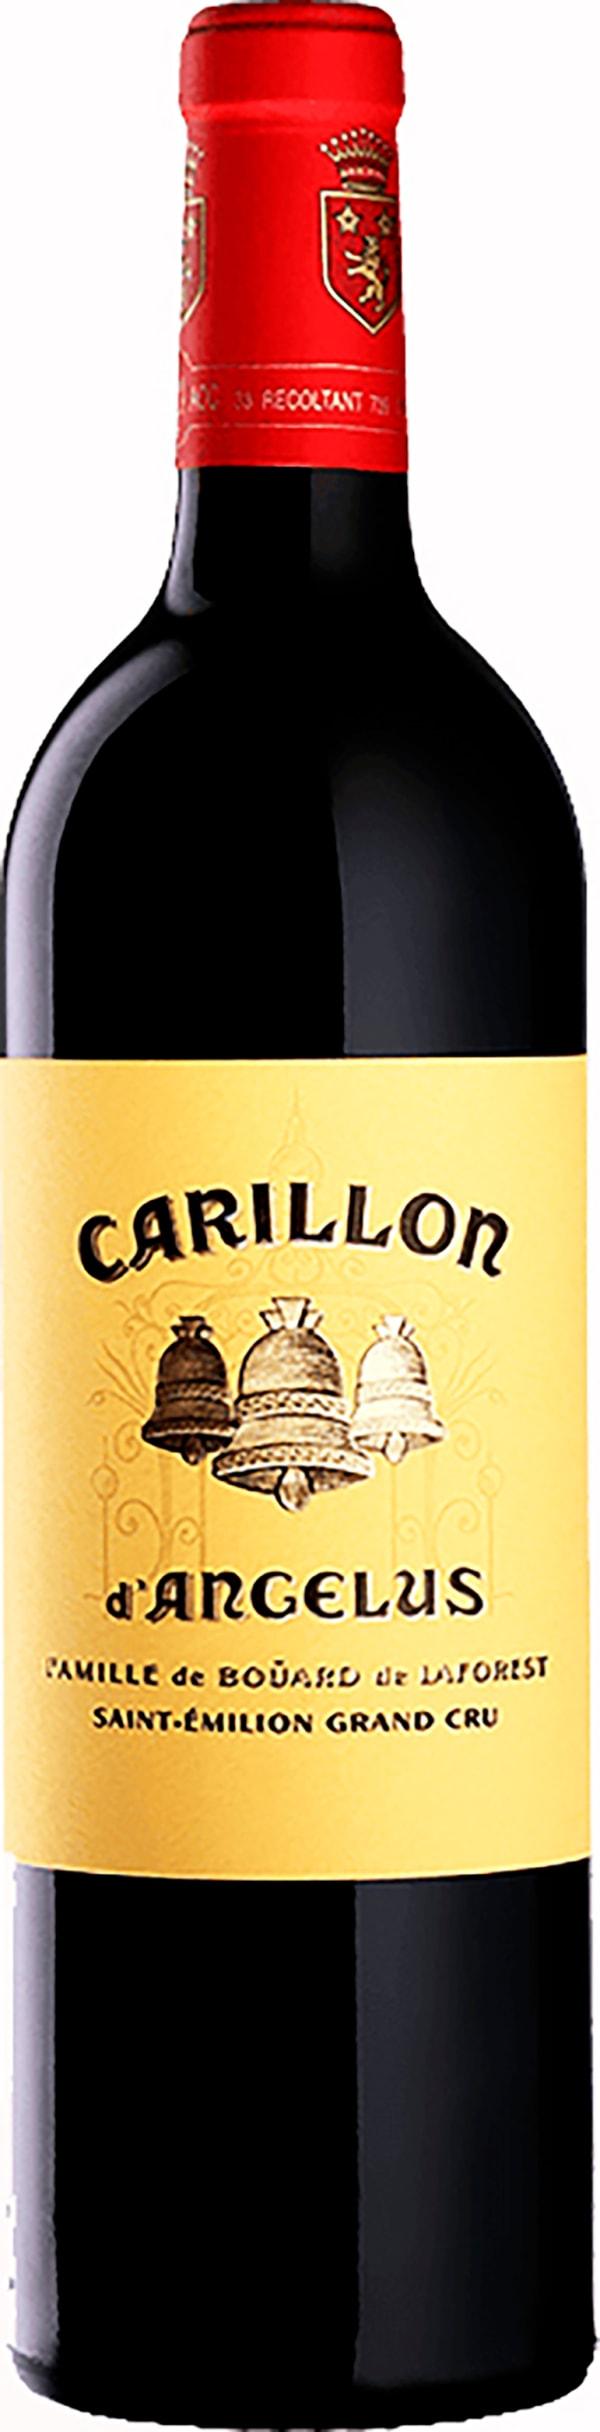 Carillon d'Angelus 2015